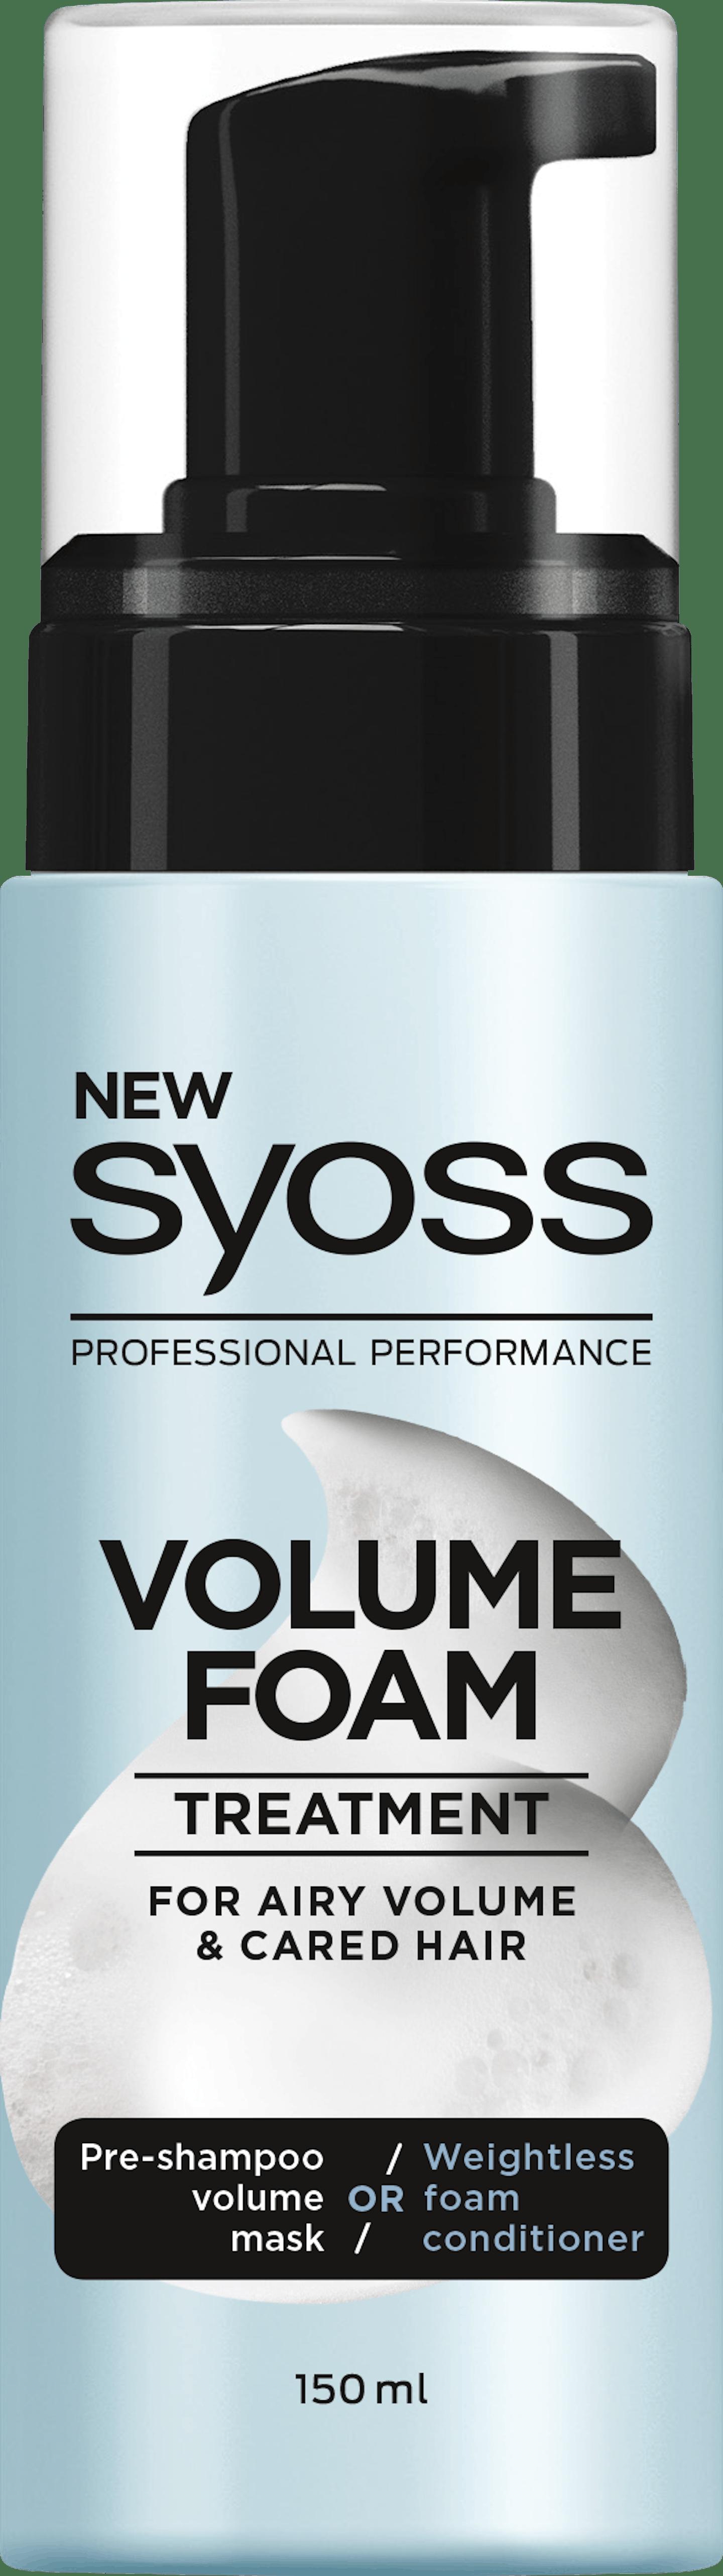 Syoss Volume Foam Treatment